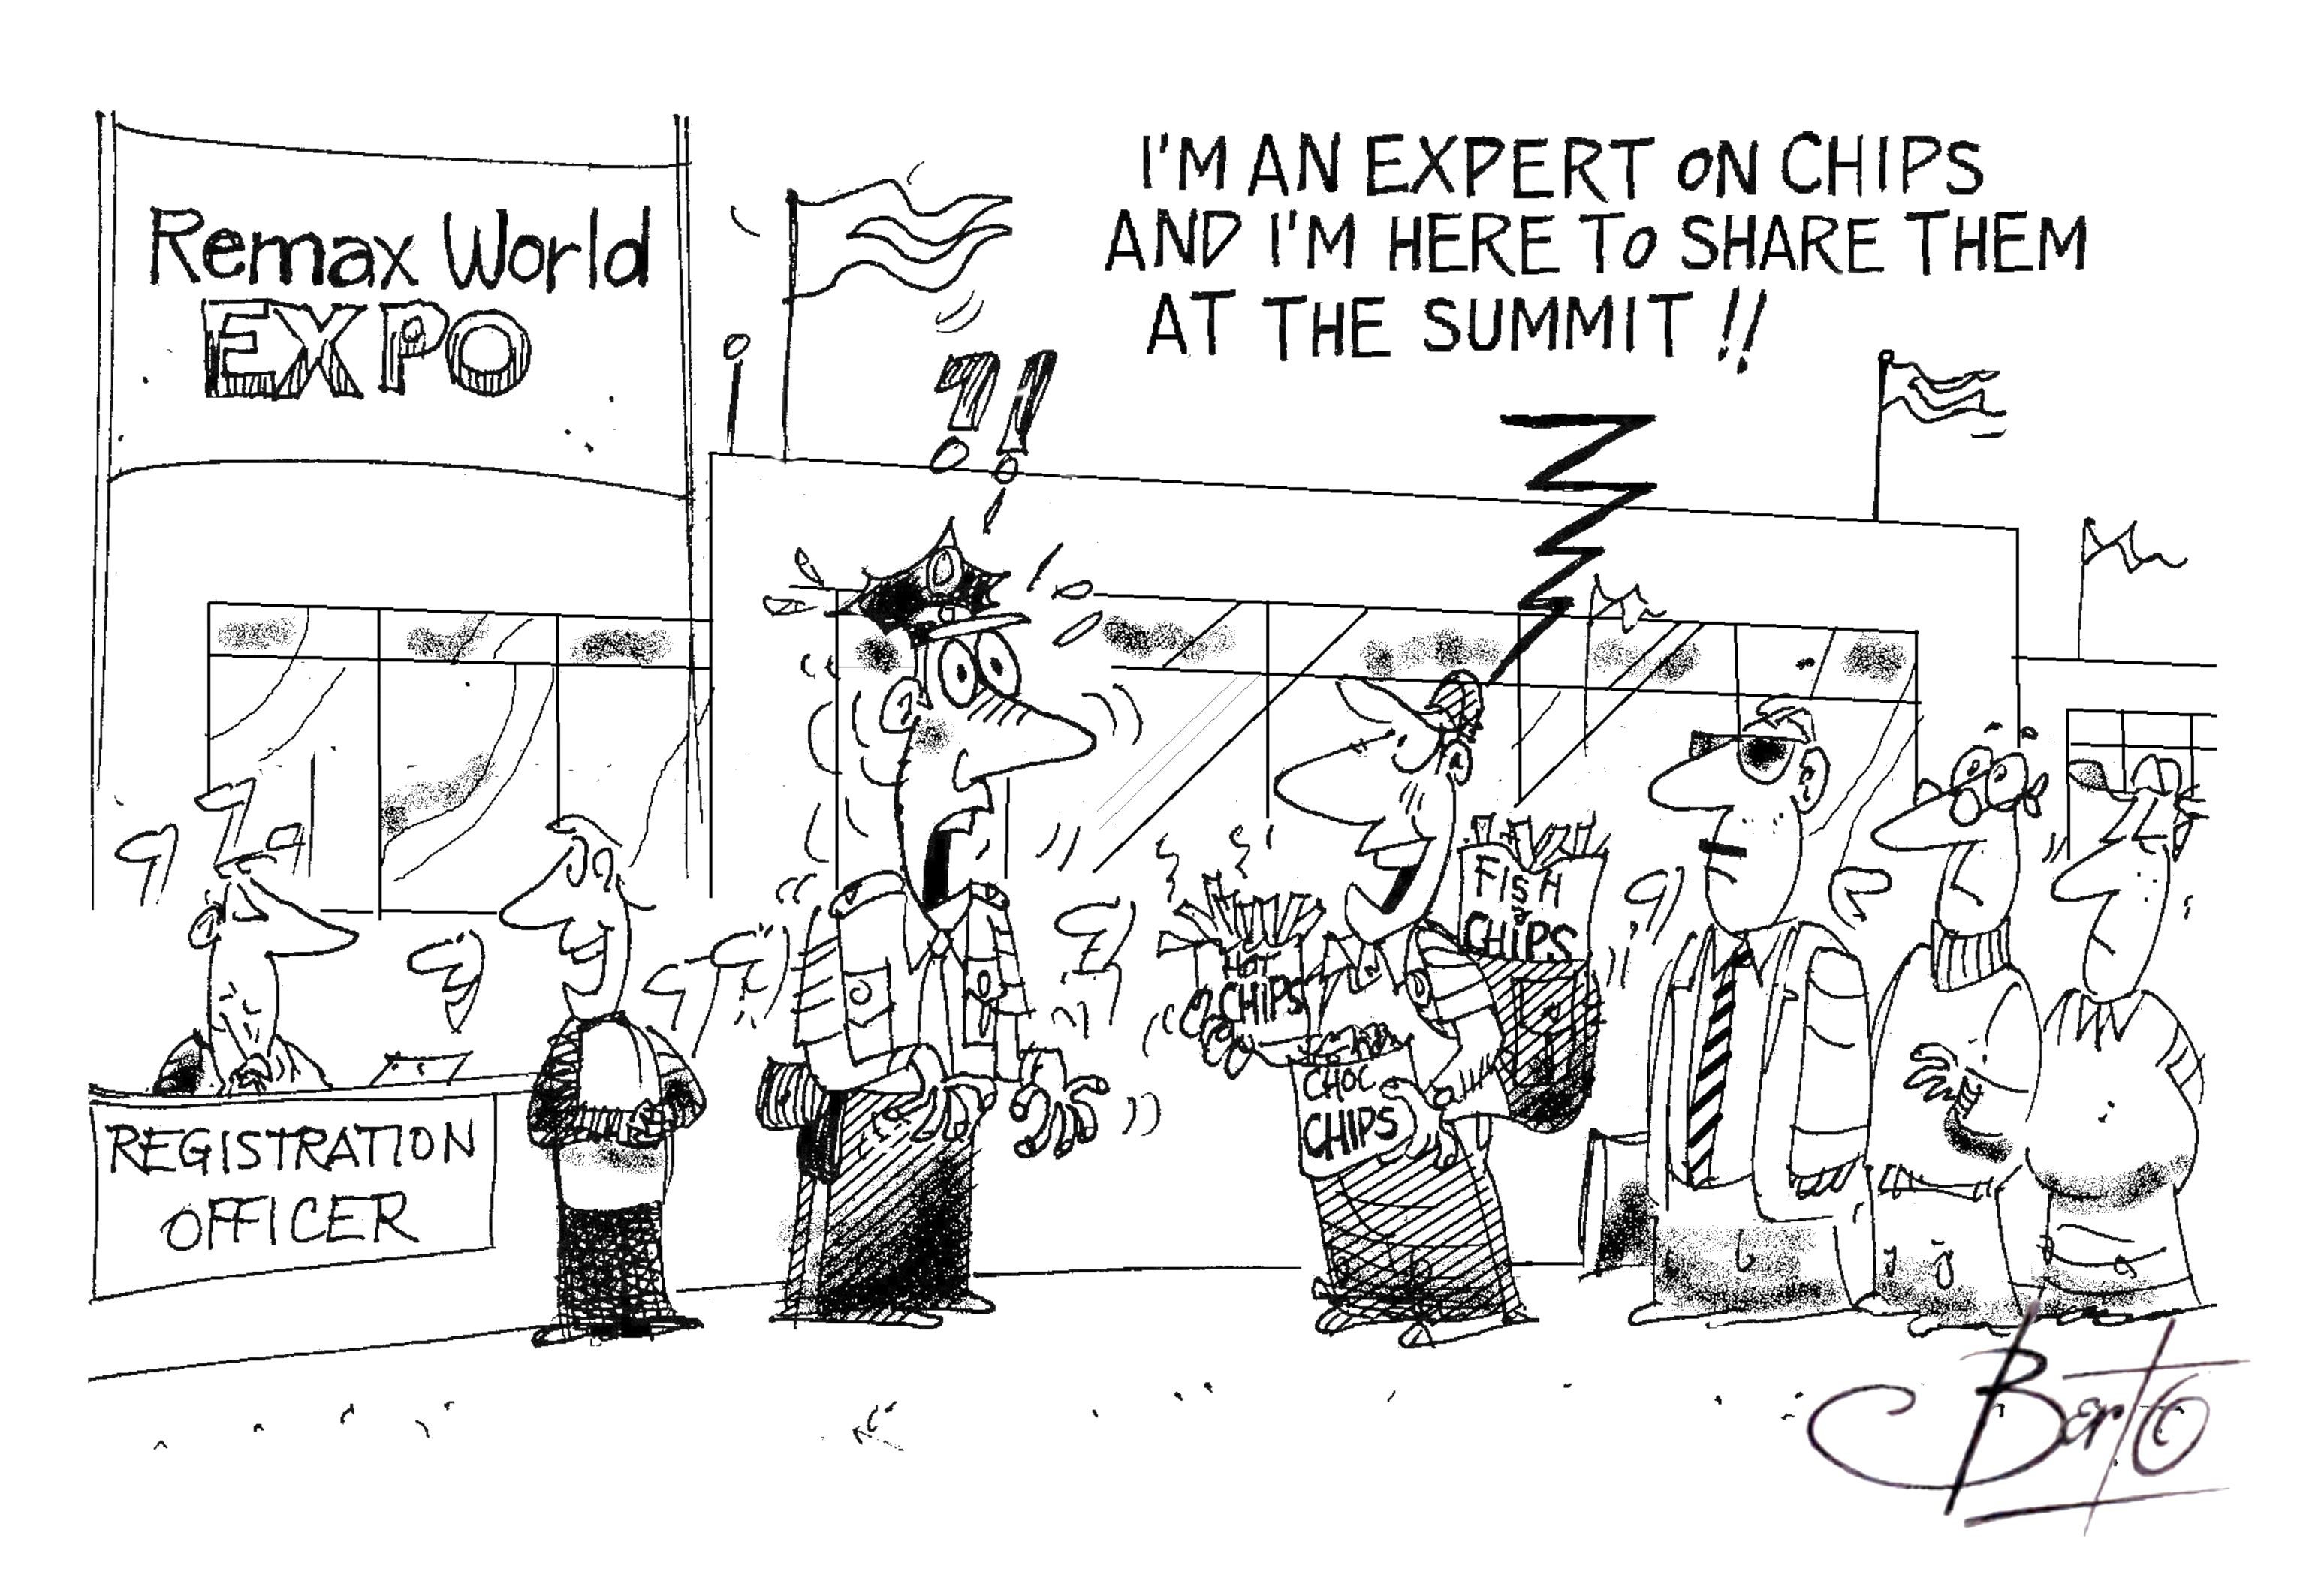 Experts Chip In at RemaxWorld Summit Berto cartoon rtmworld